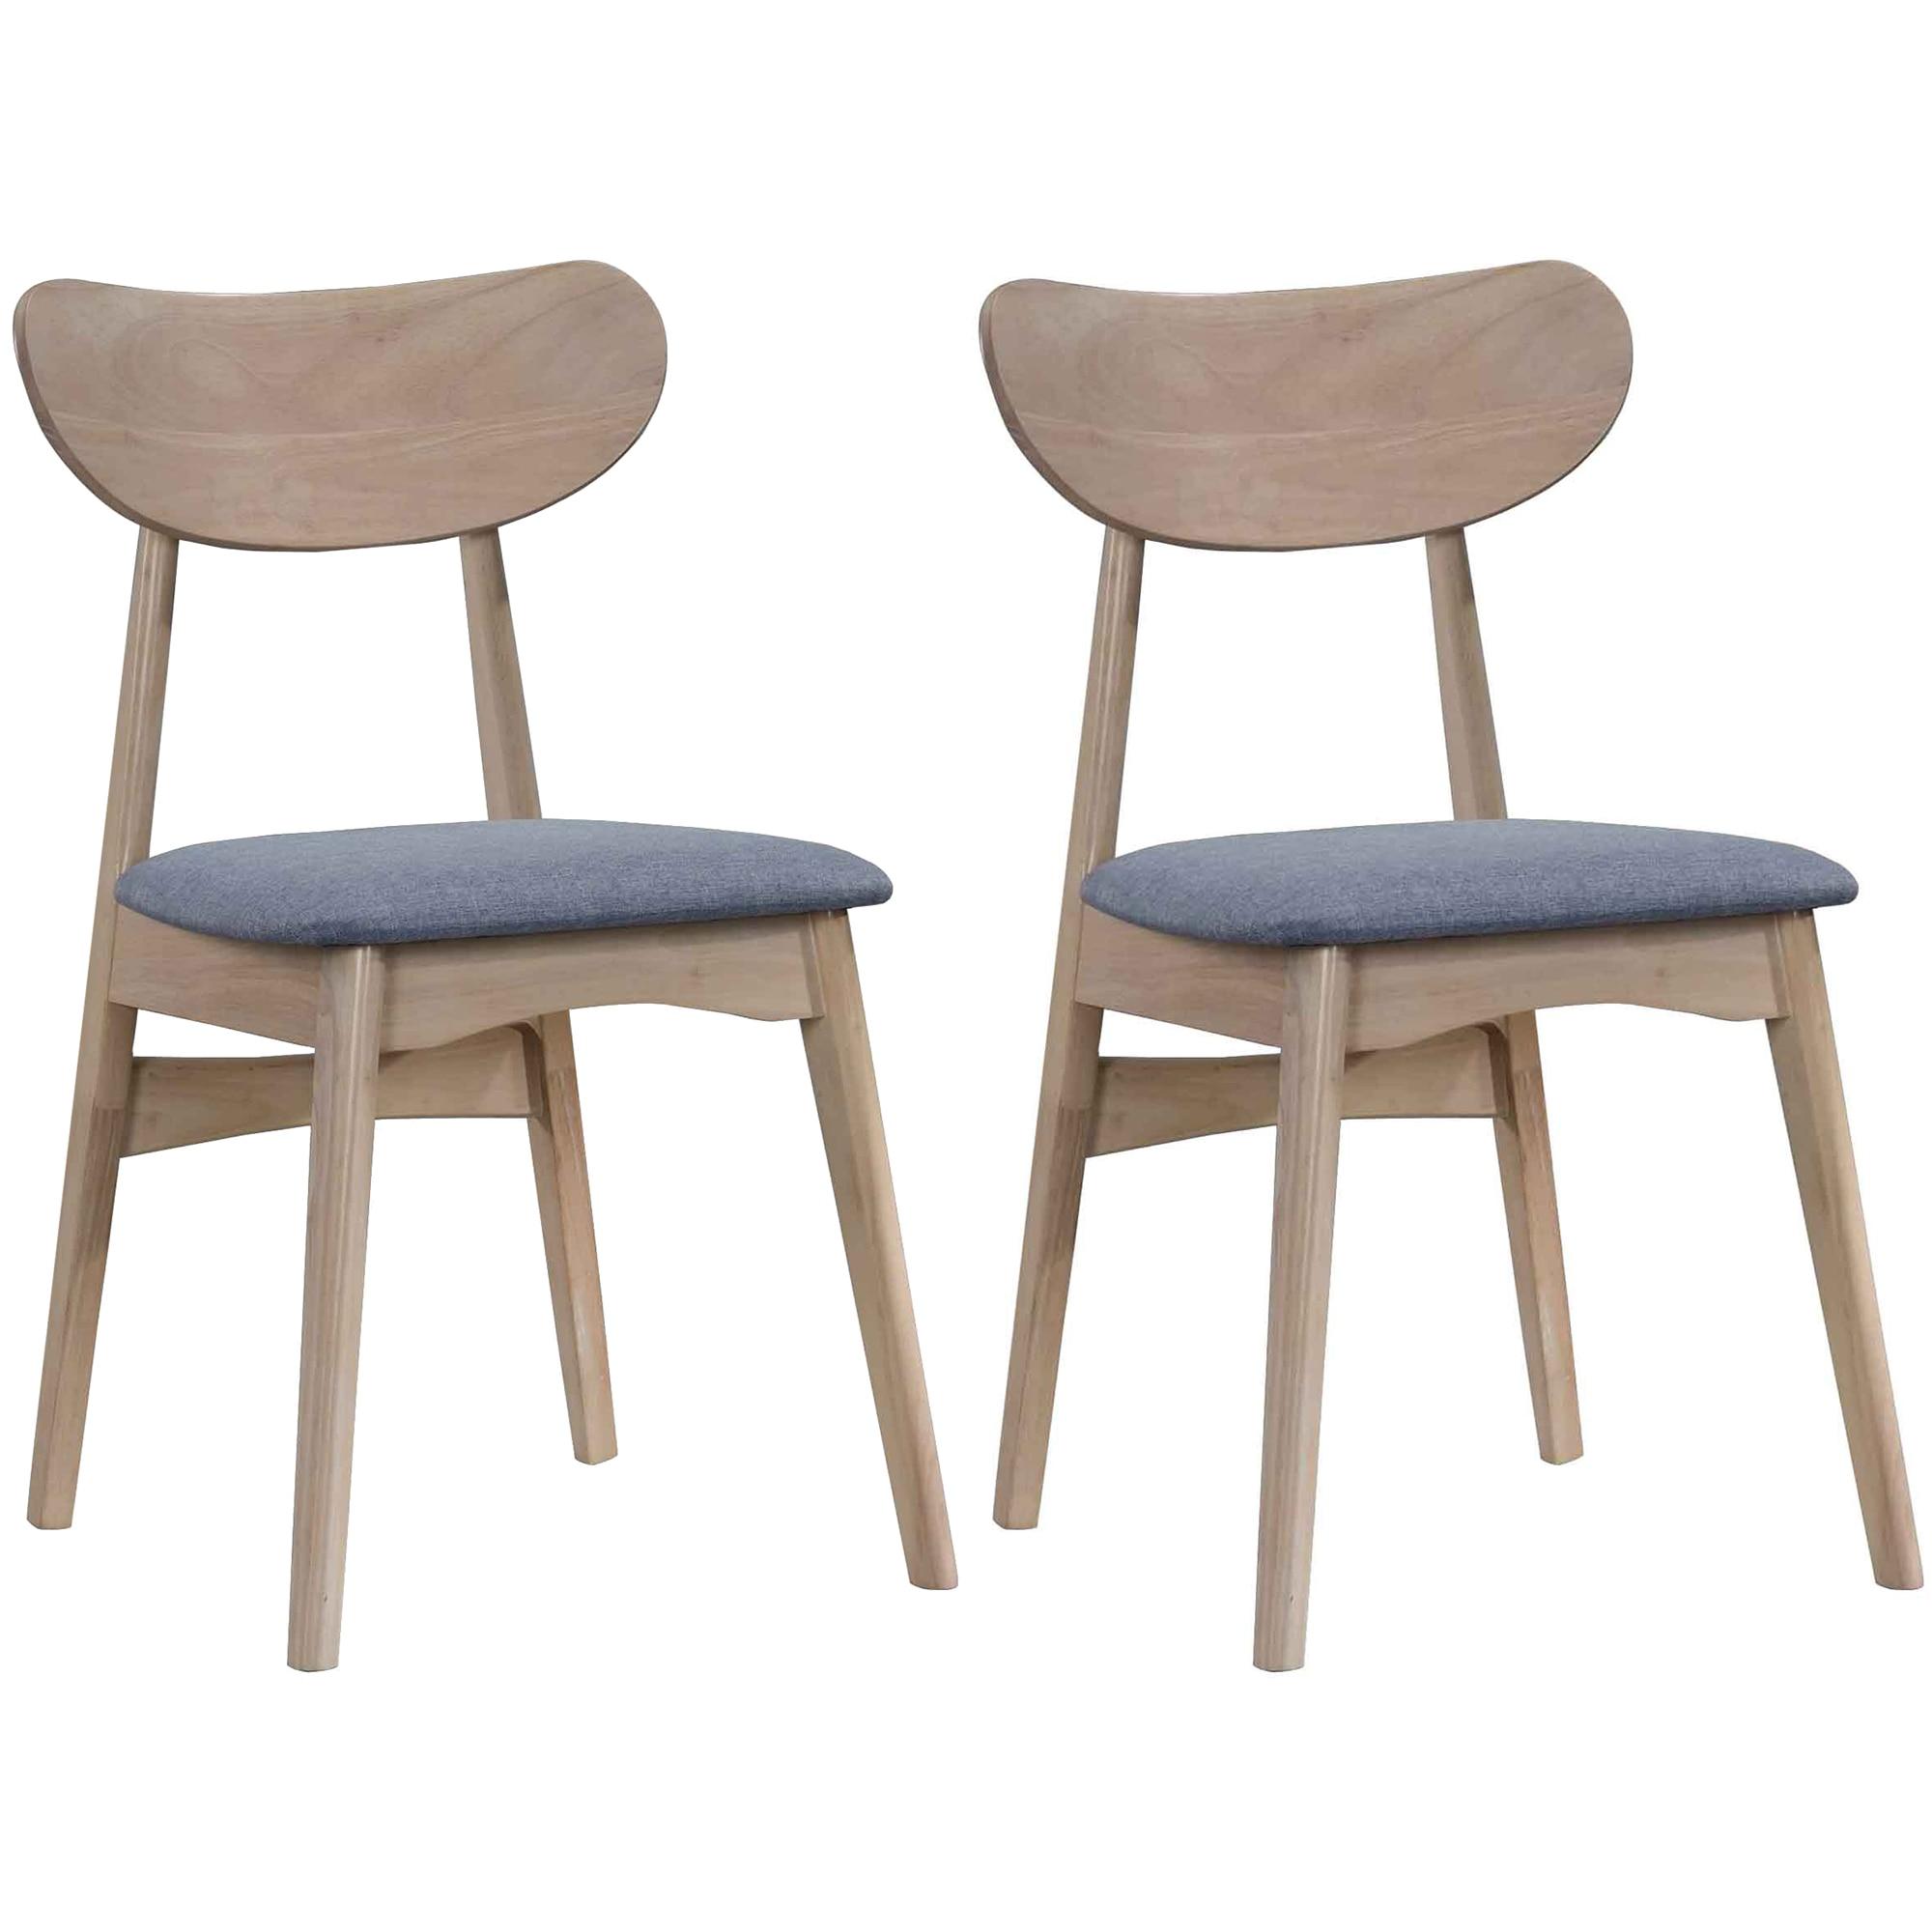 Fotografie Set 2 scaune dining Kring Mod, 46x54x80 cm, Gri